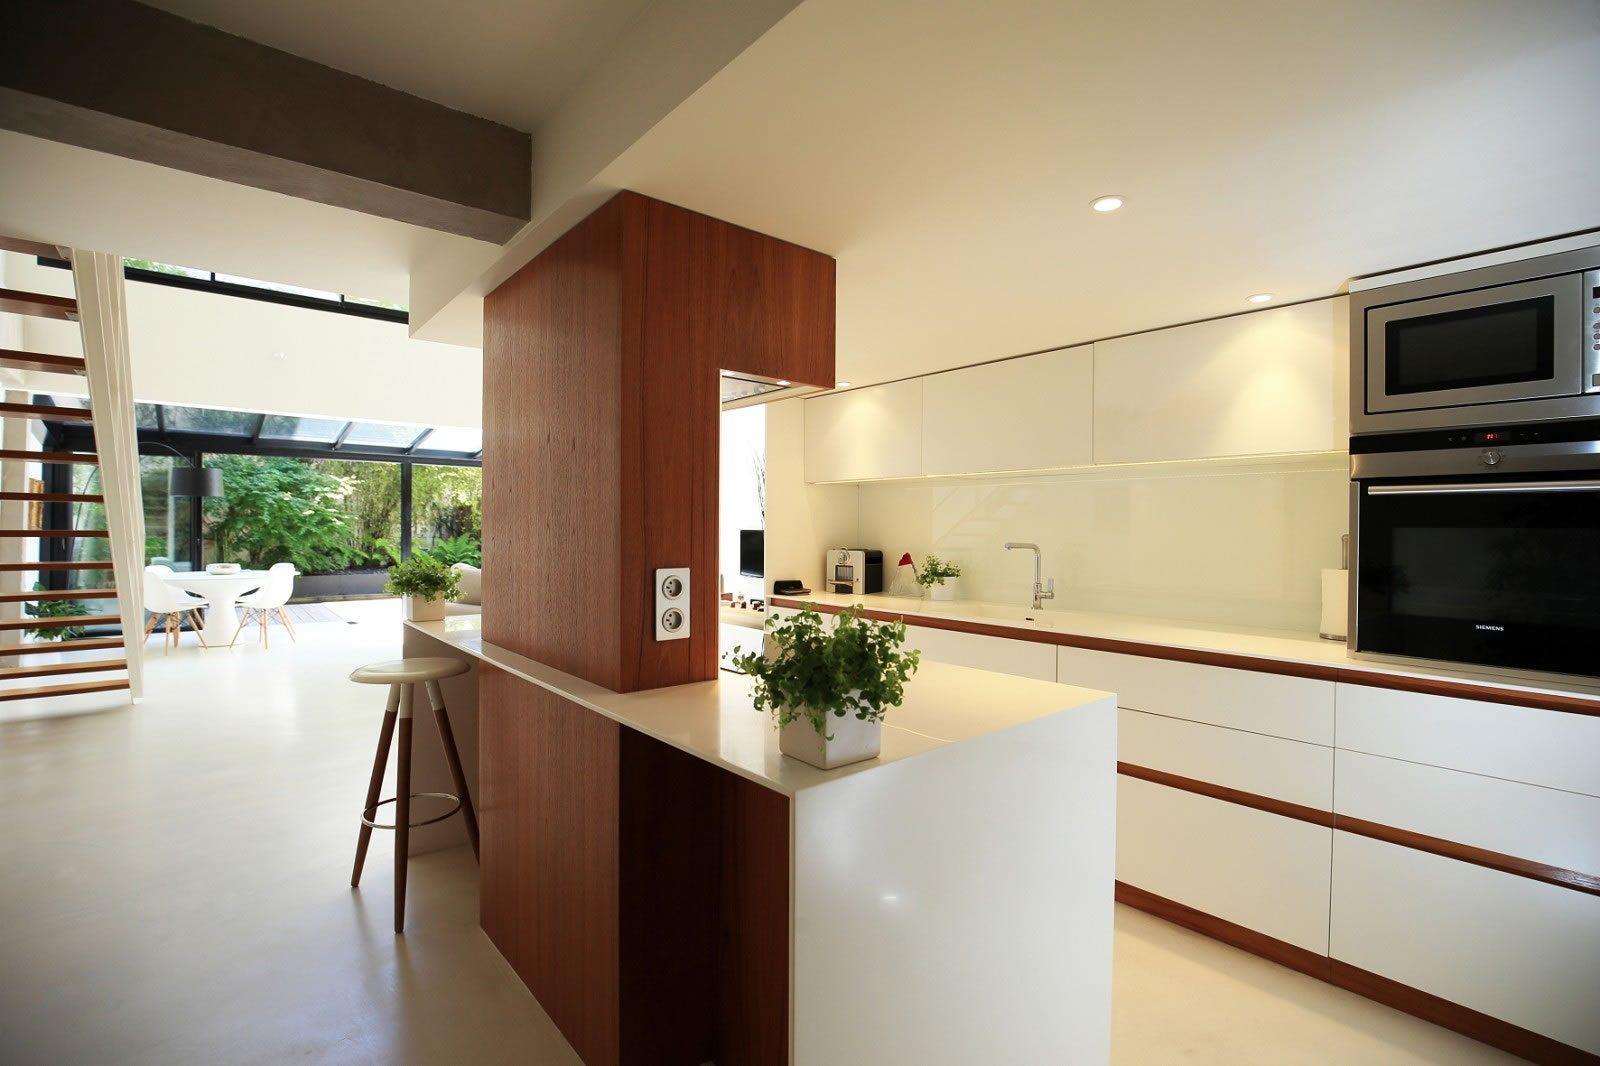 appartement-loft-a-vendre-terrasse-bassin-billard-garage